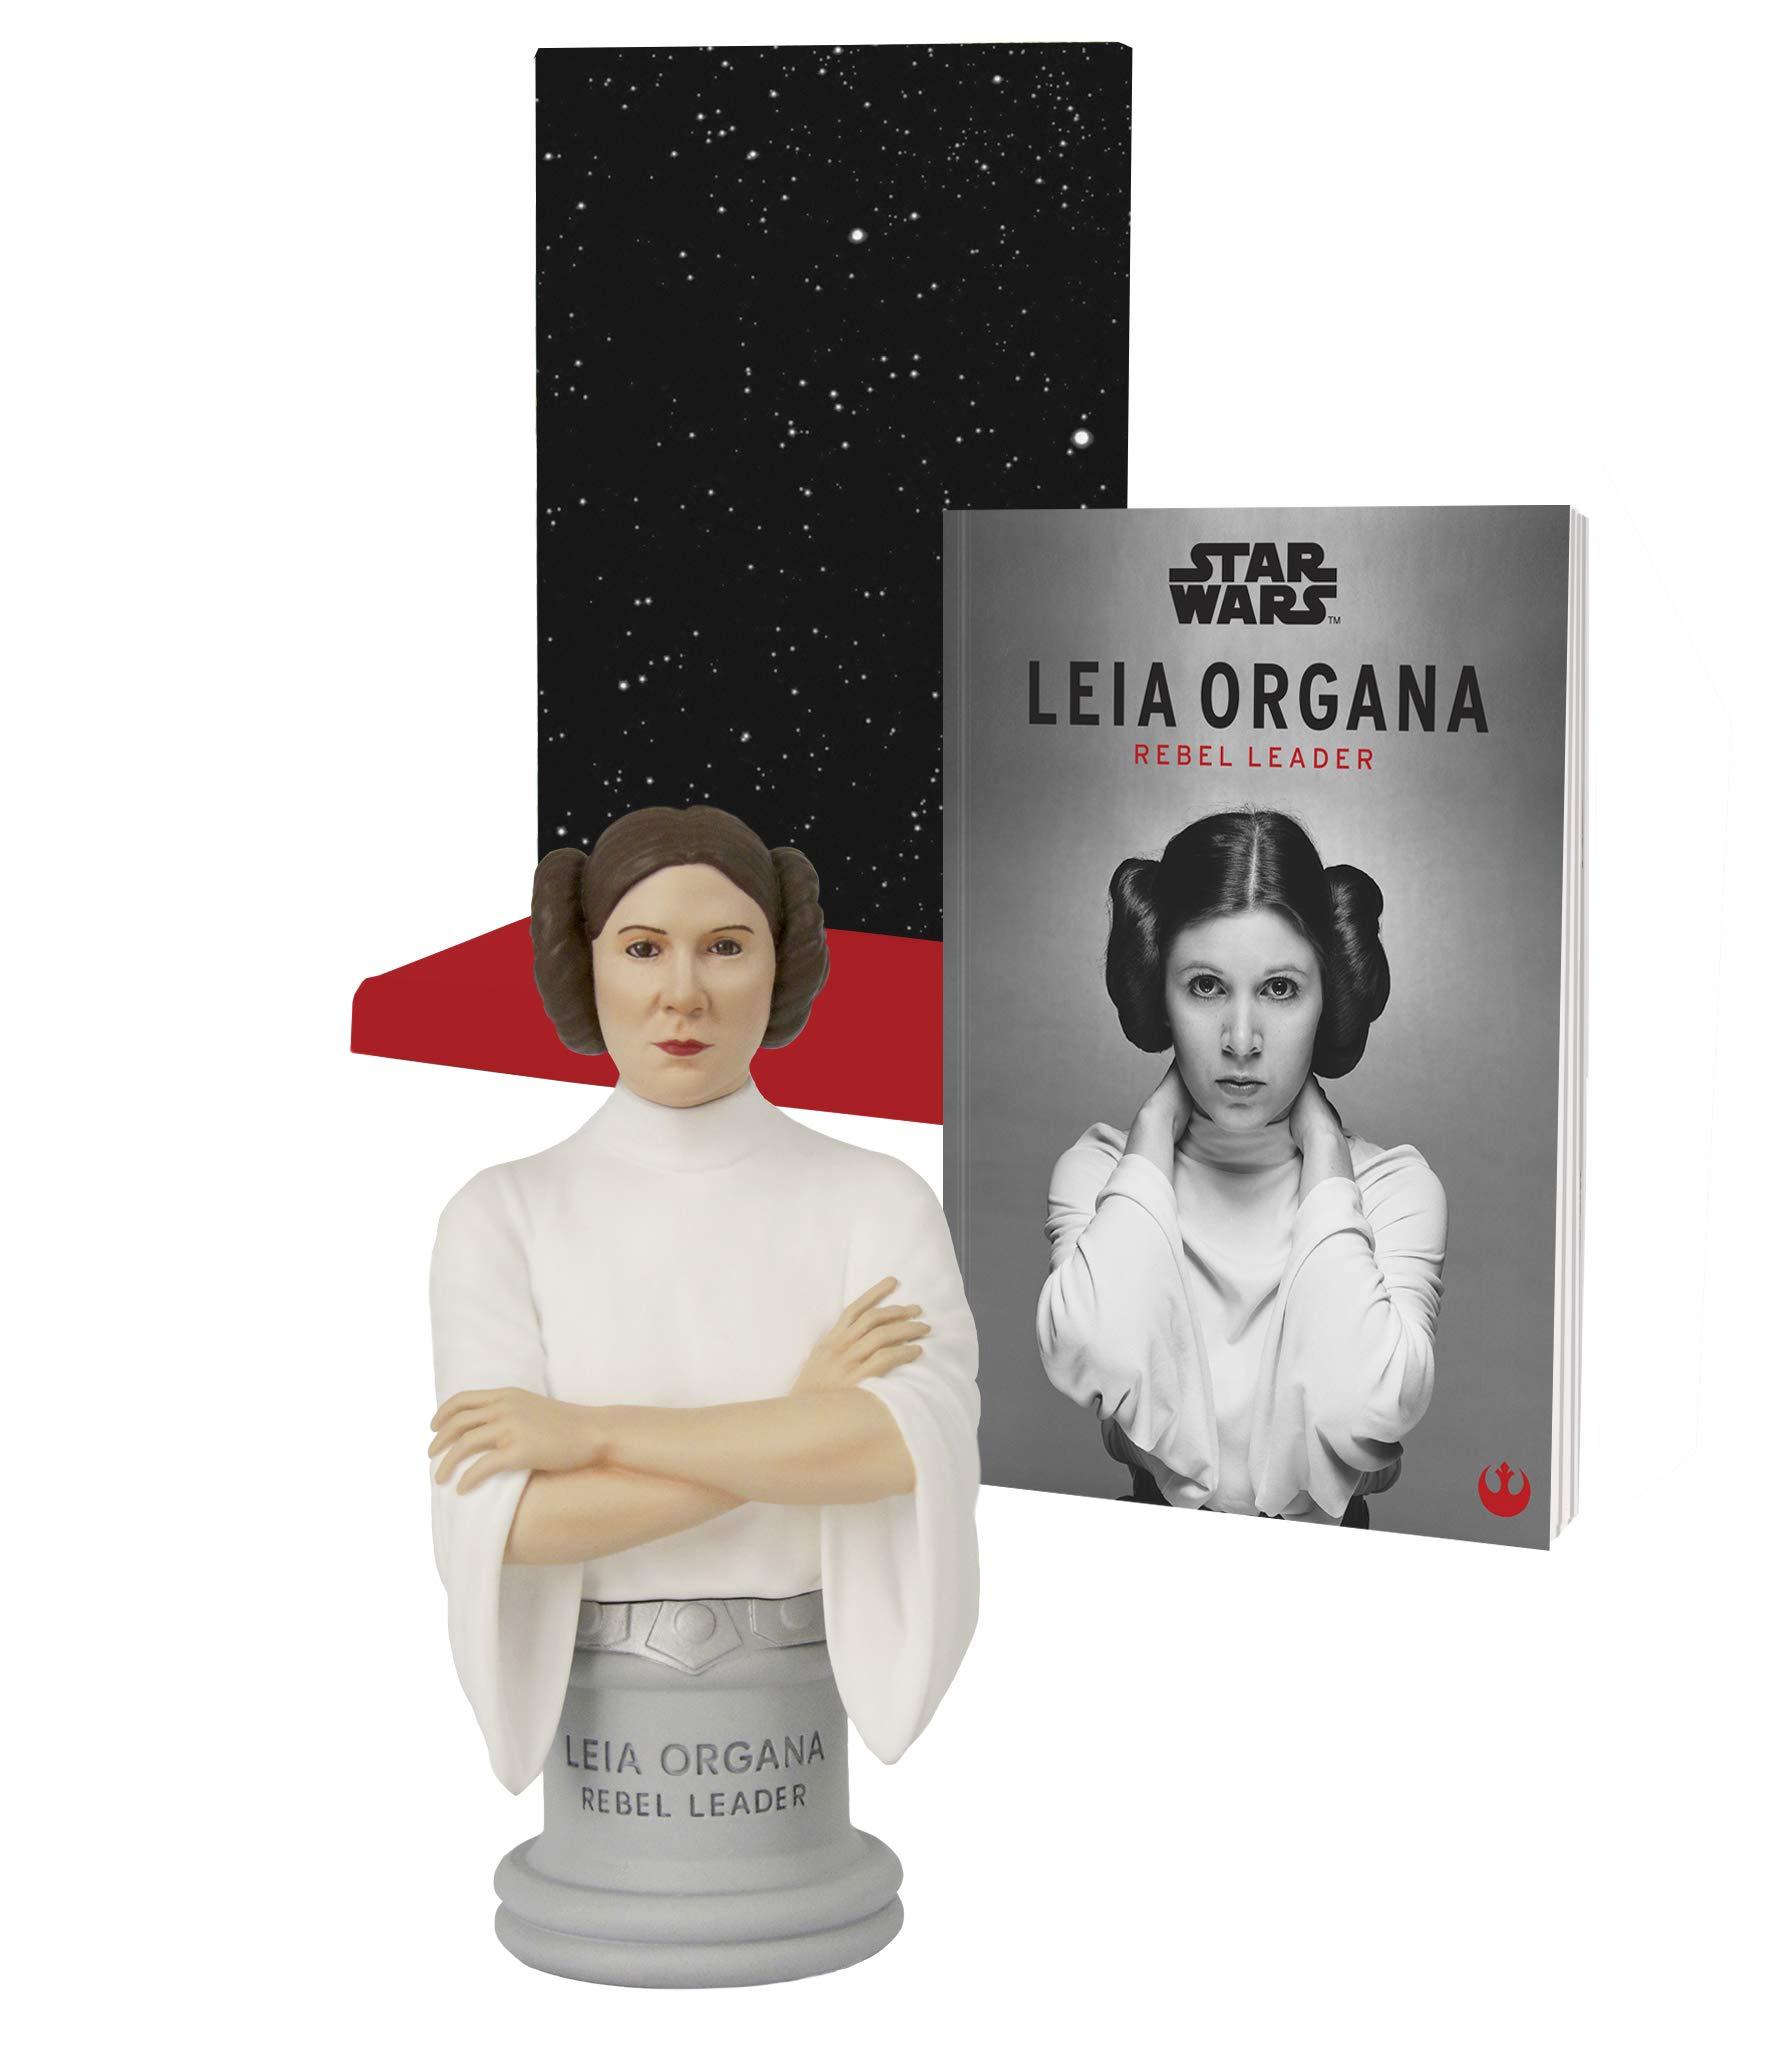 Star Wars™: Leia Organa Rebel Leader Box